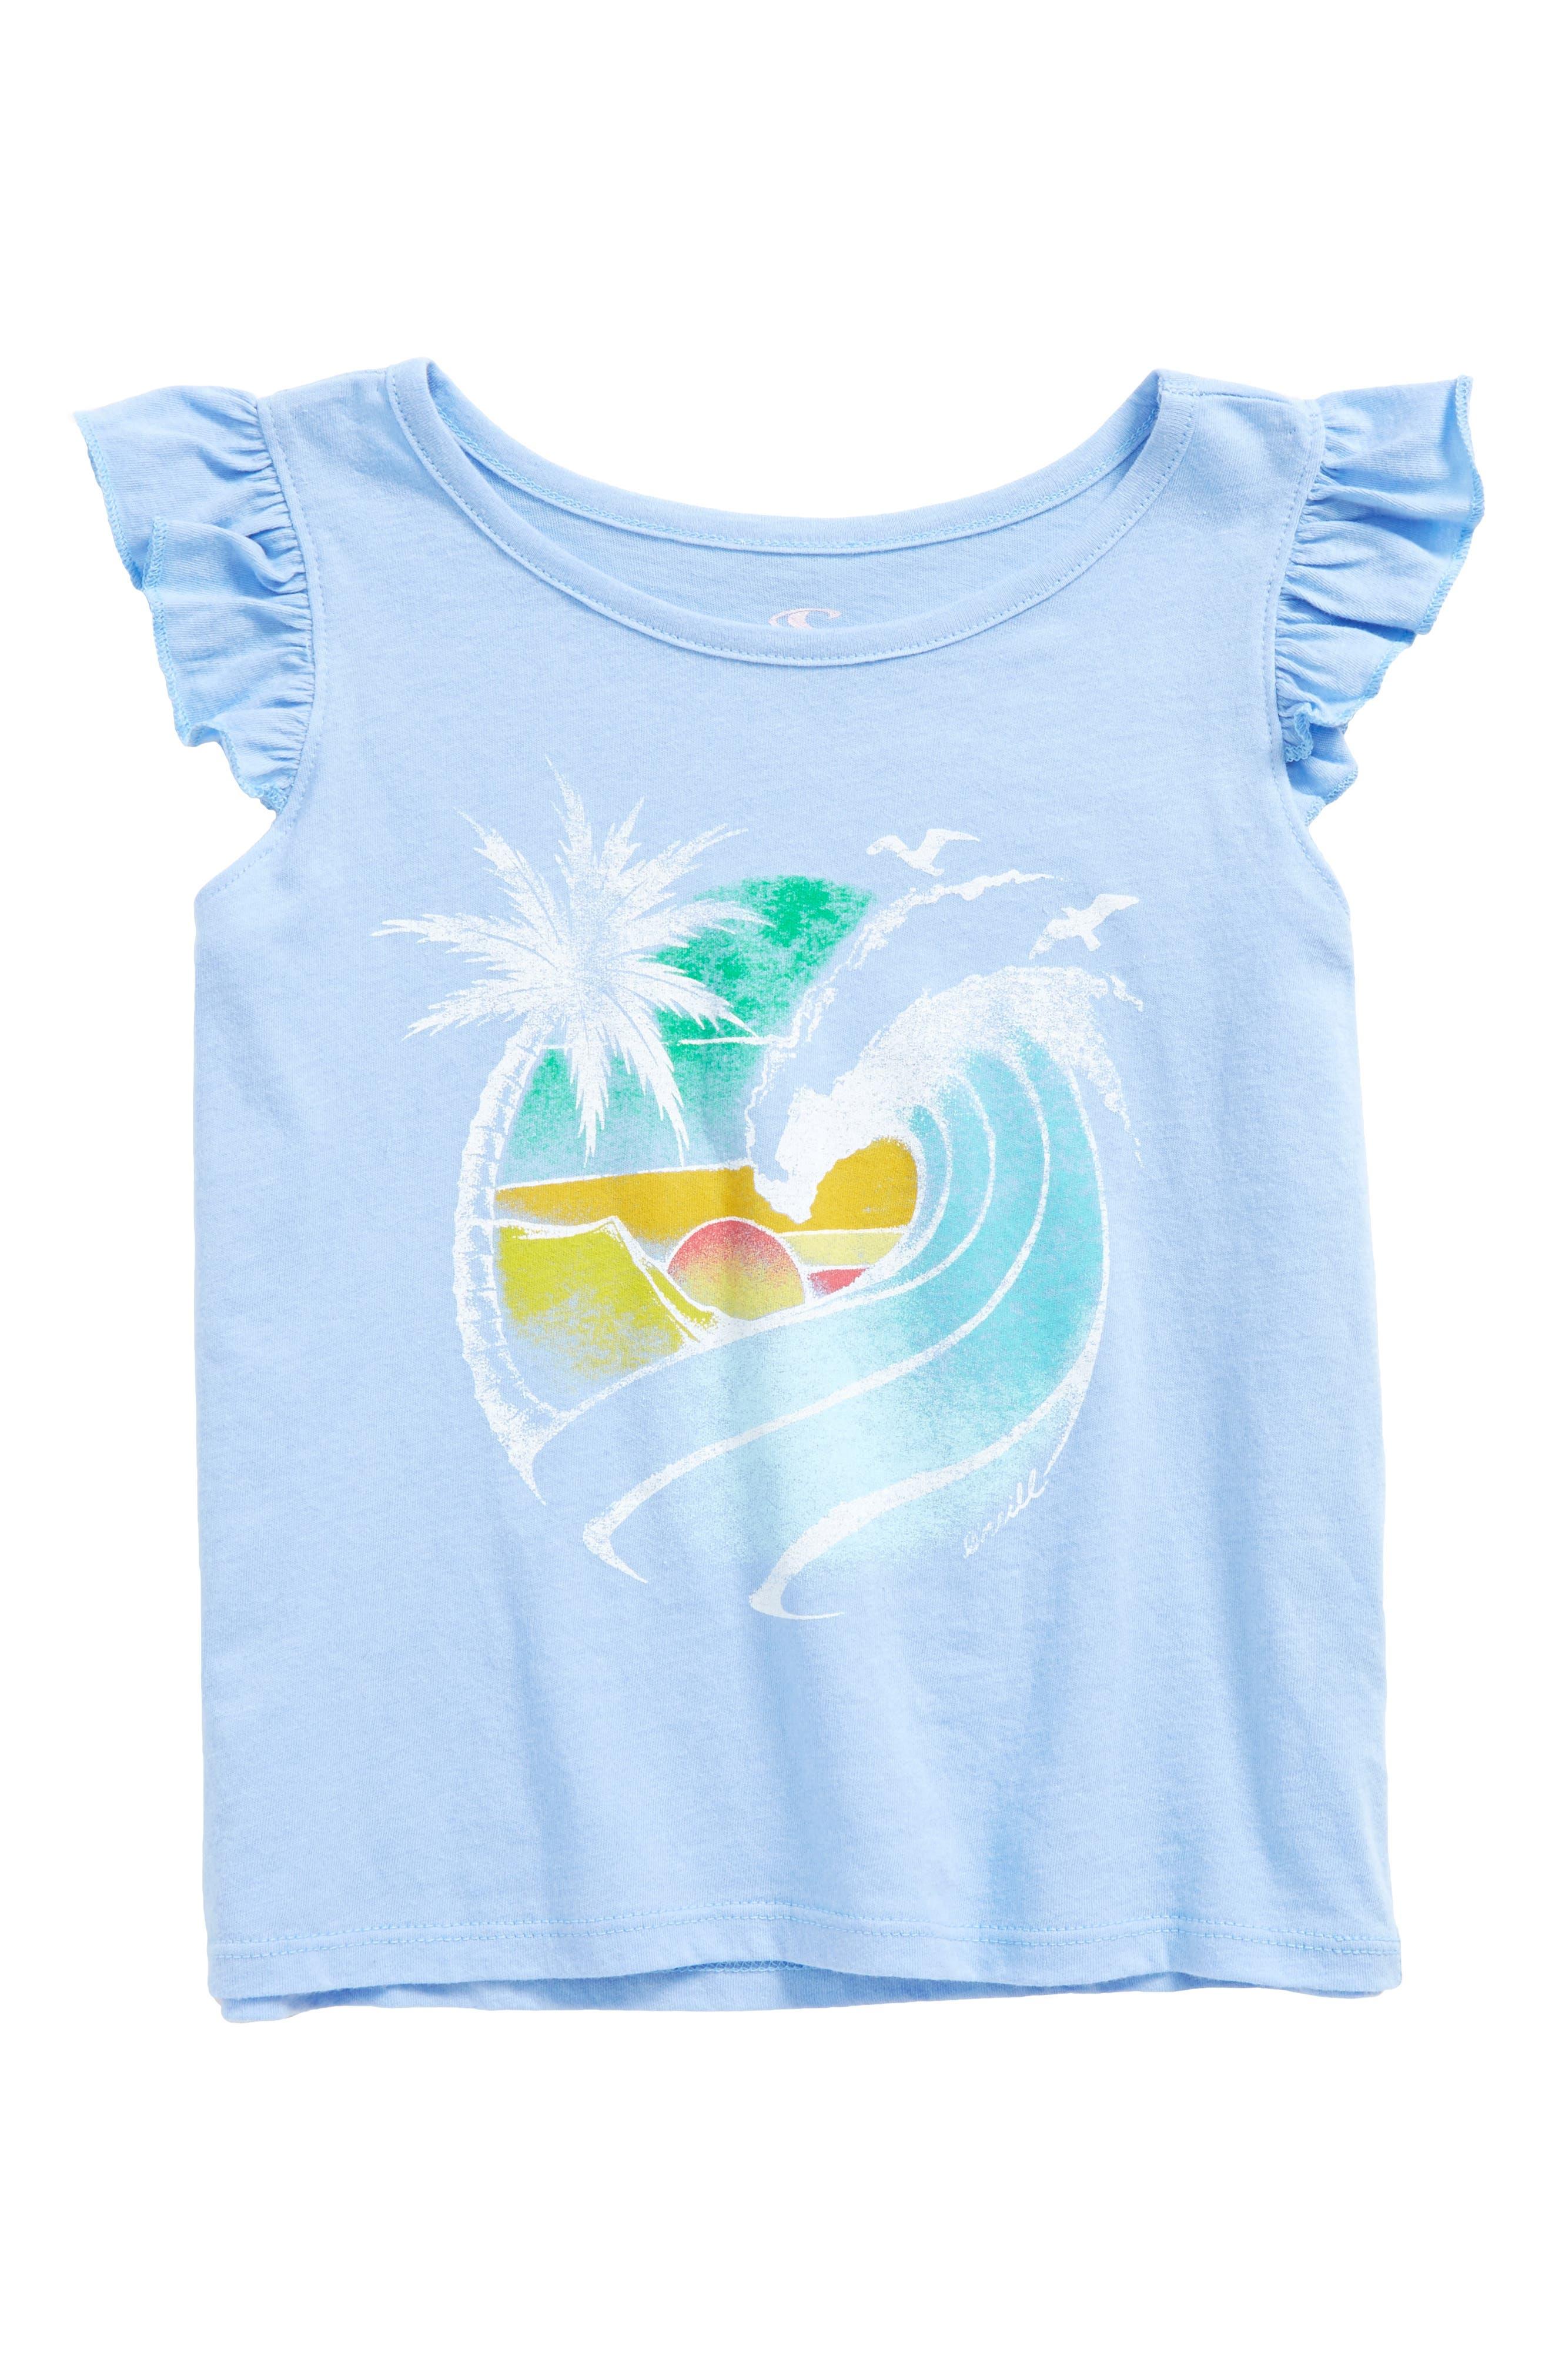 Beach Dreams Graphic Tee,                         Main,                         color, Bleached Denim- Ctb